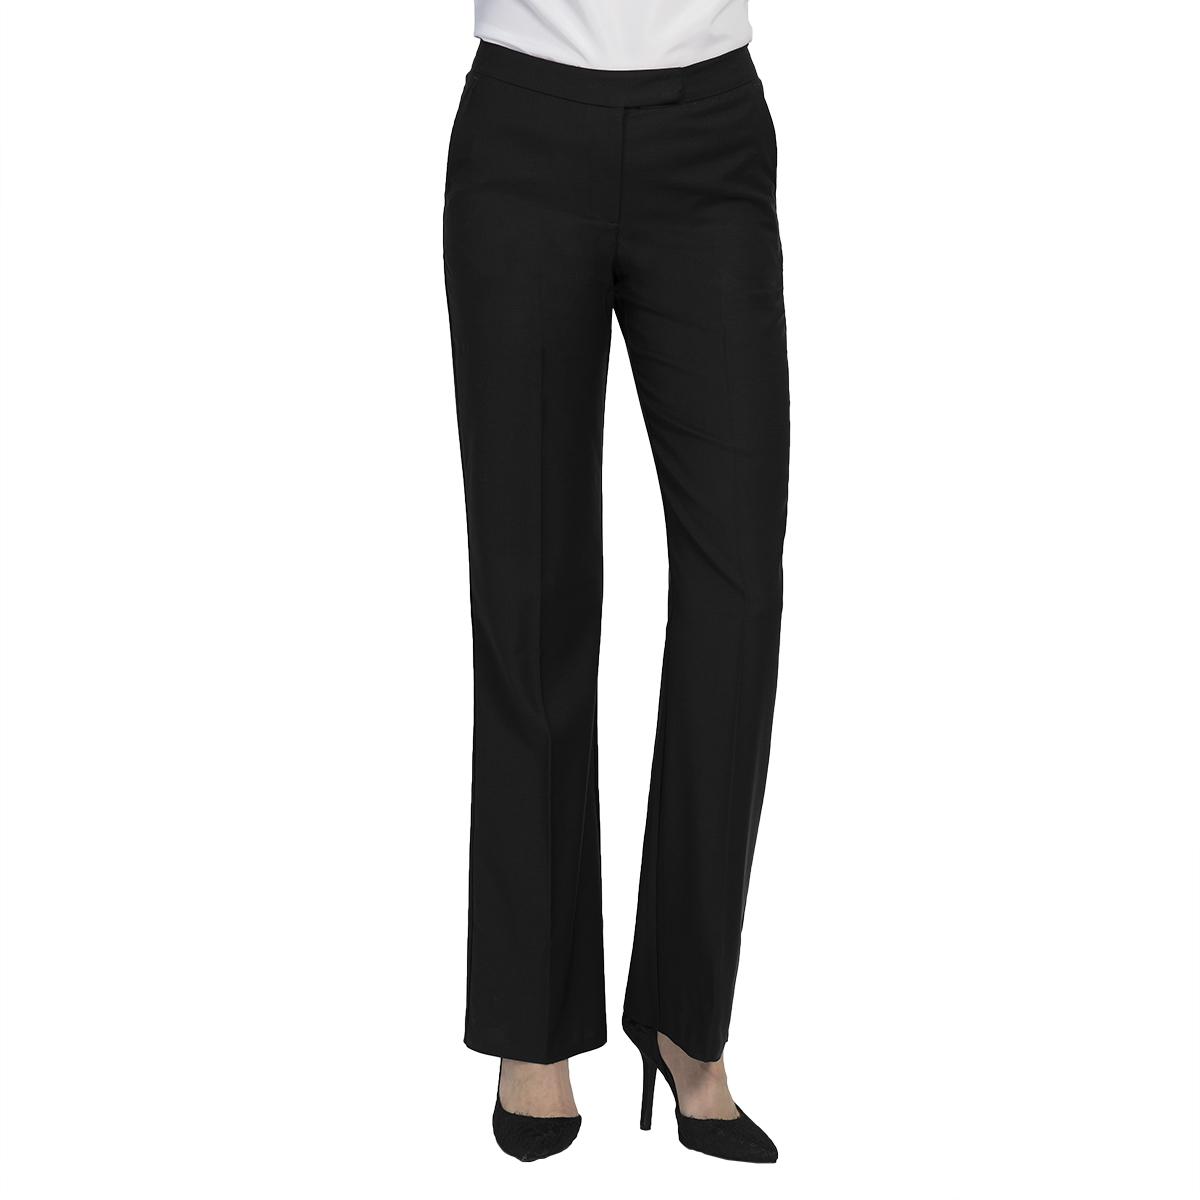 Women's Optiweave Polywool Stretch Pants